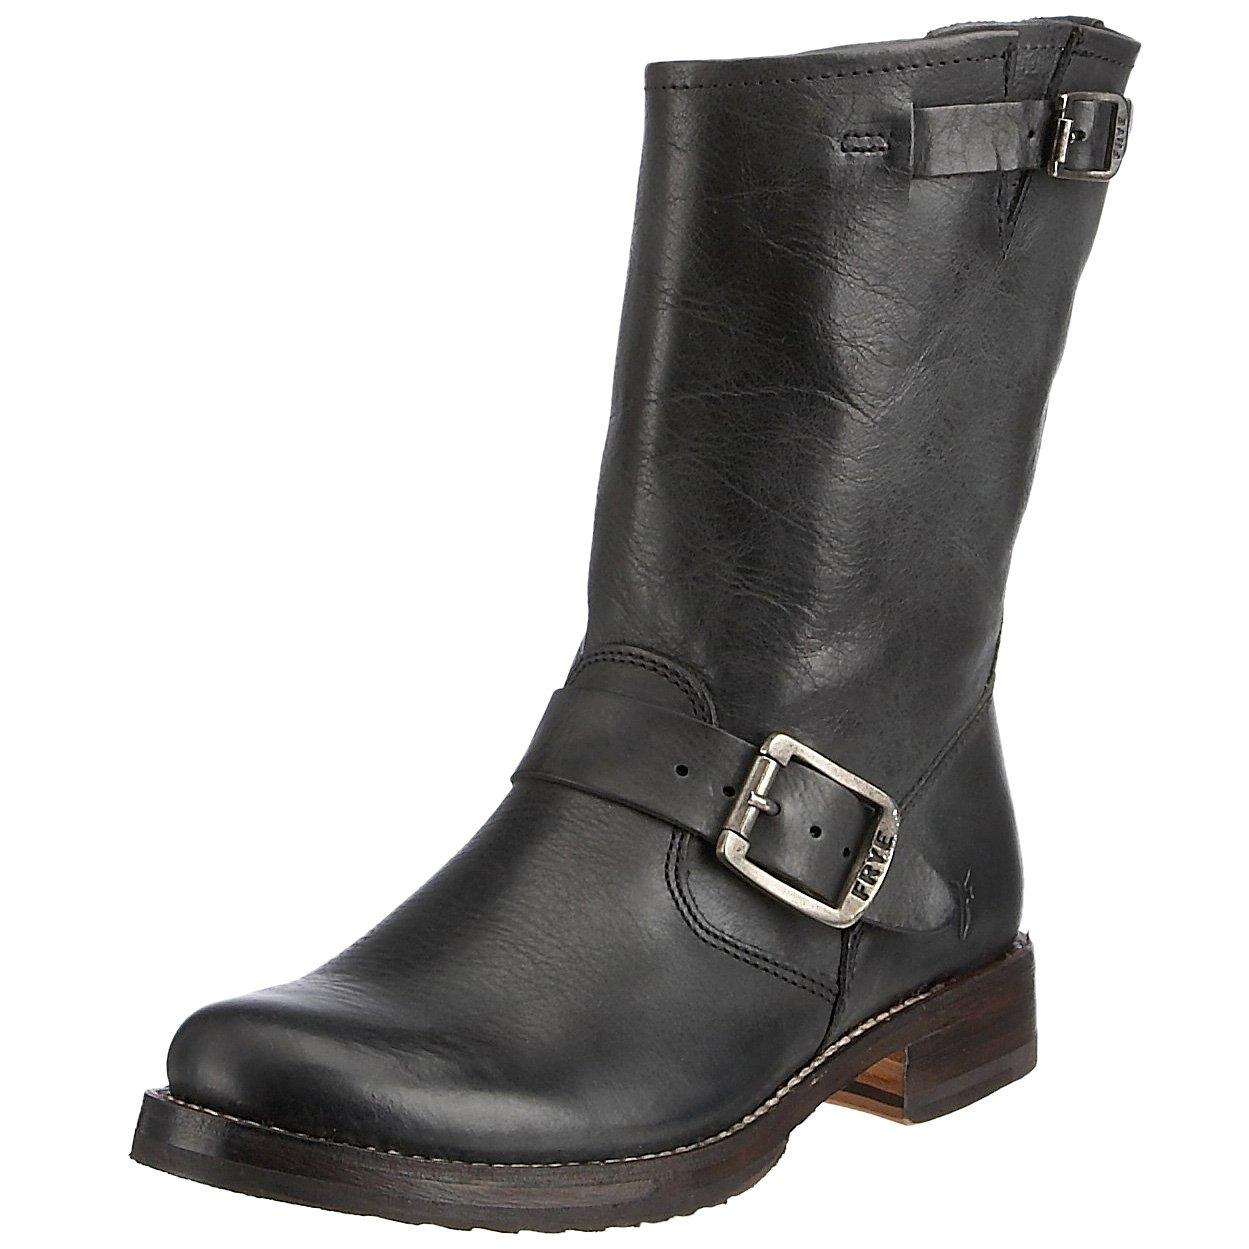 FRYE Women's Veronica Short Boot, Black Tumbled Full Grain, 7.5 M US